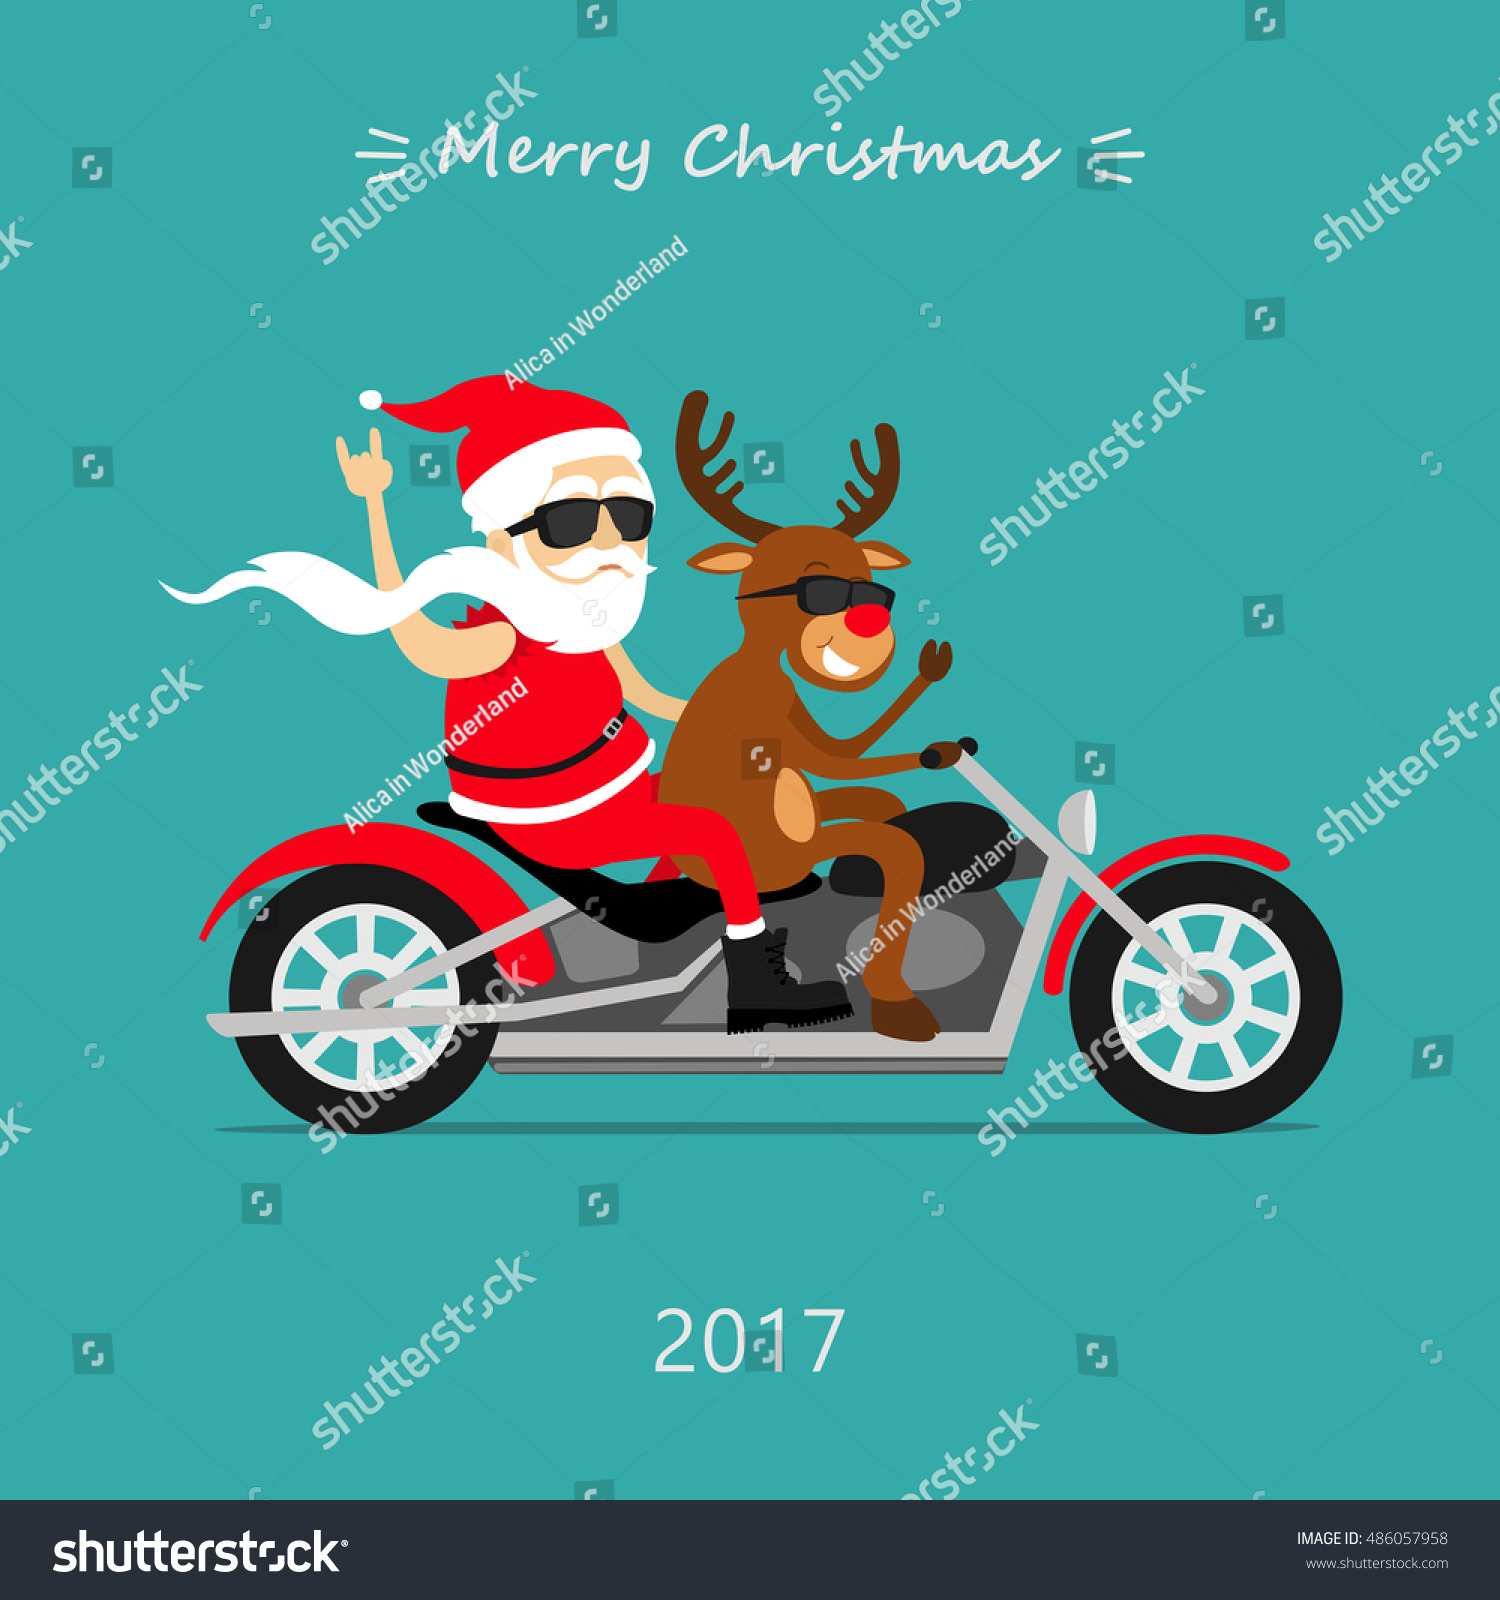 Merry Christmas Santa Claus Deer Ride Stock Photo (Photo, Vector ...